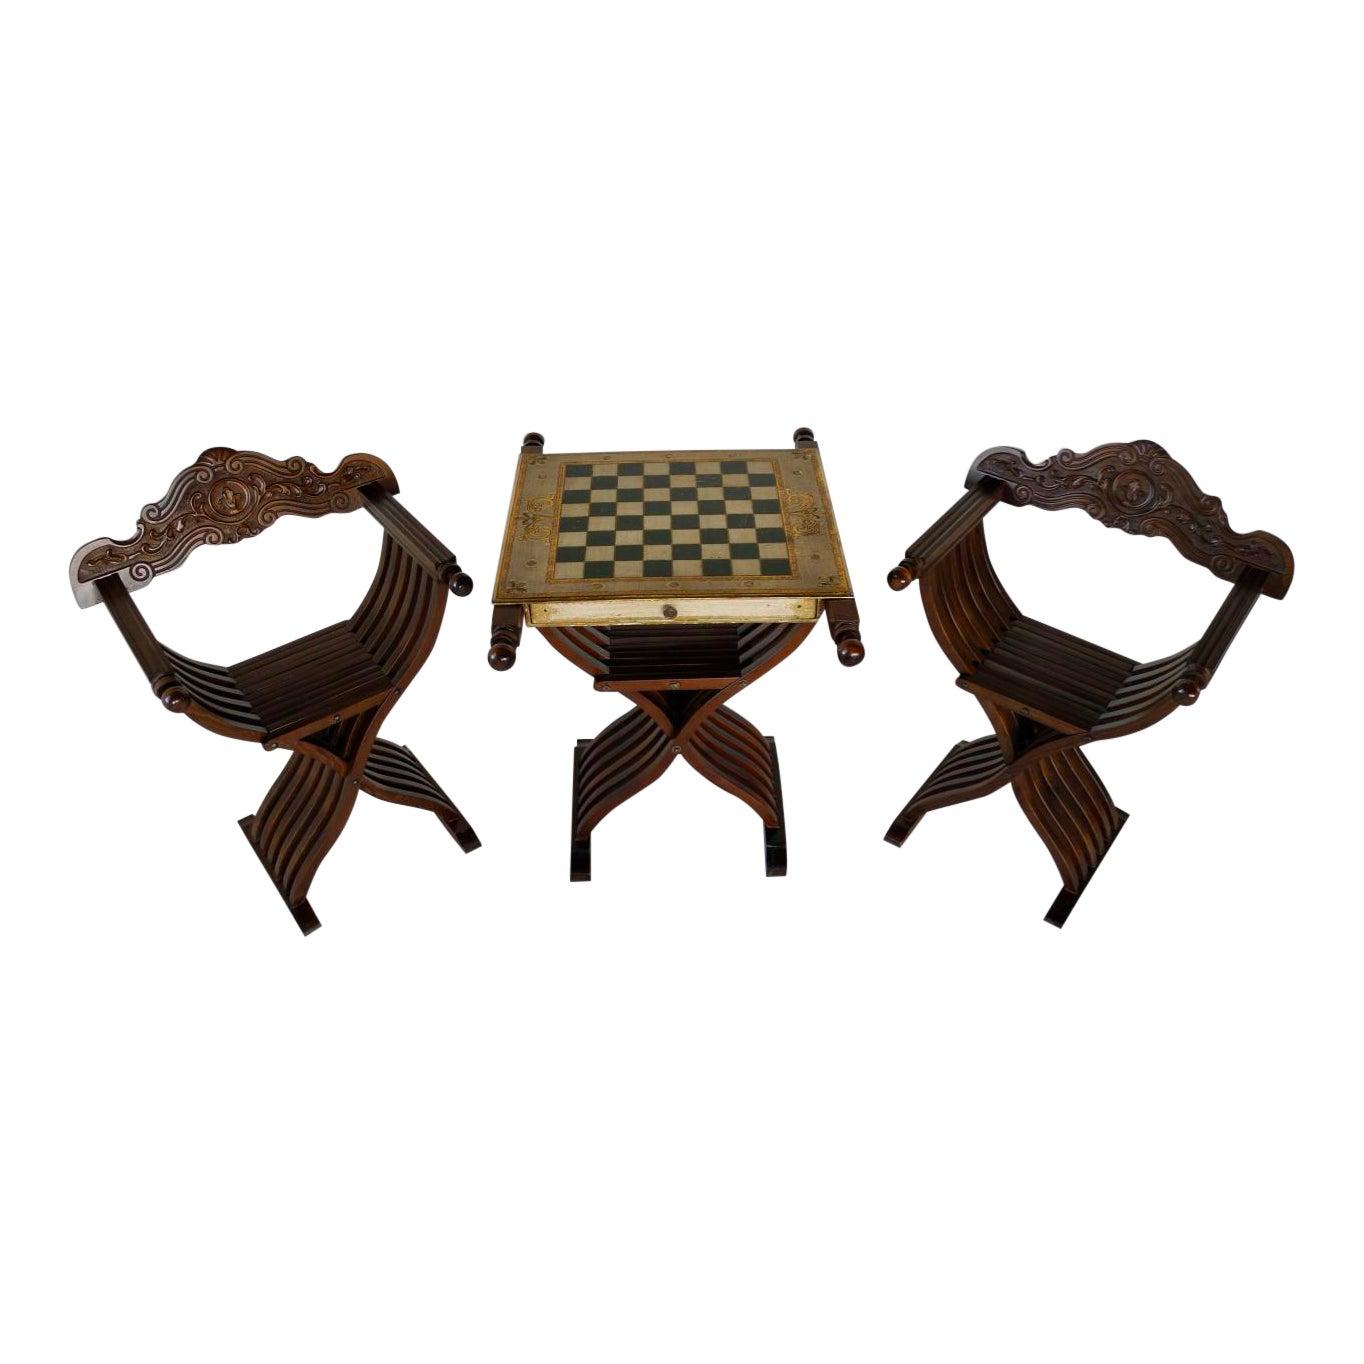 Savonarola Chairs Slatted Folding Table With Chess Board Set Of 3 Chairish